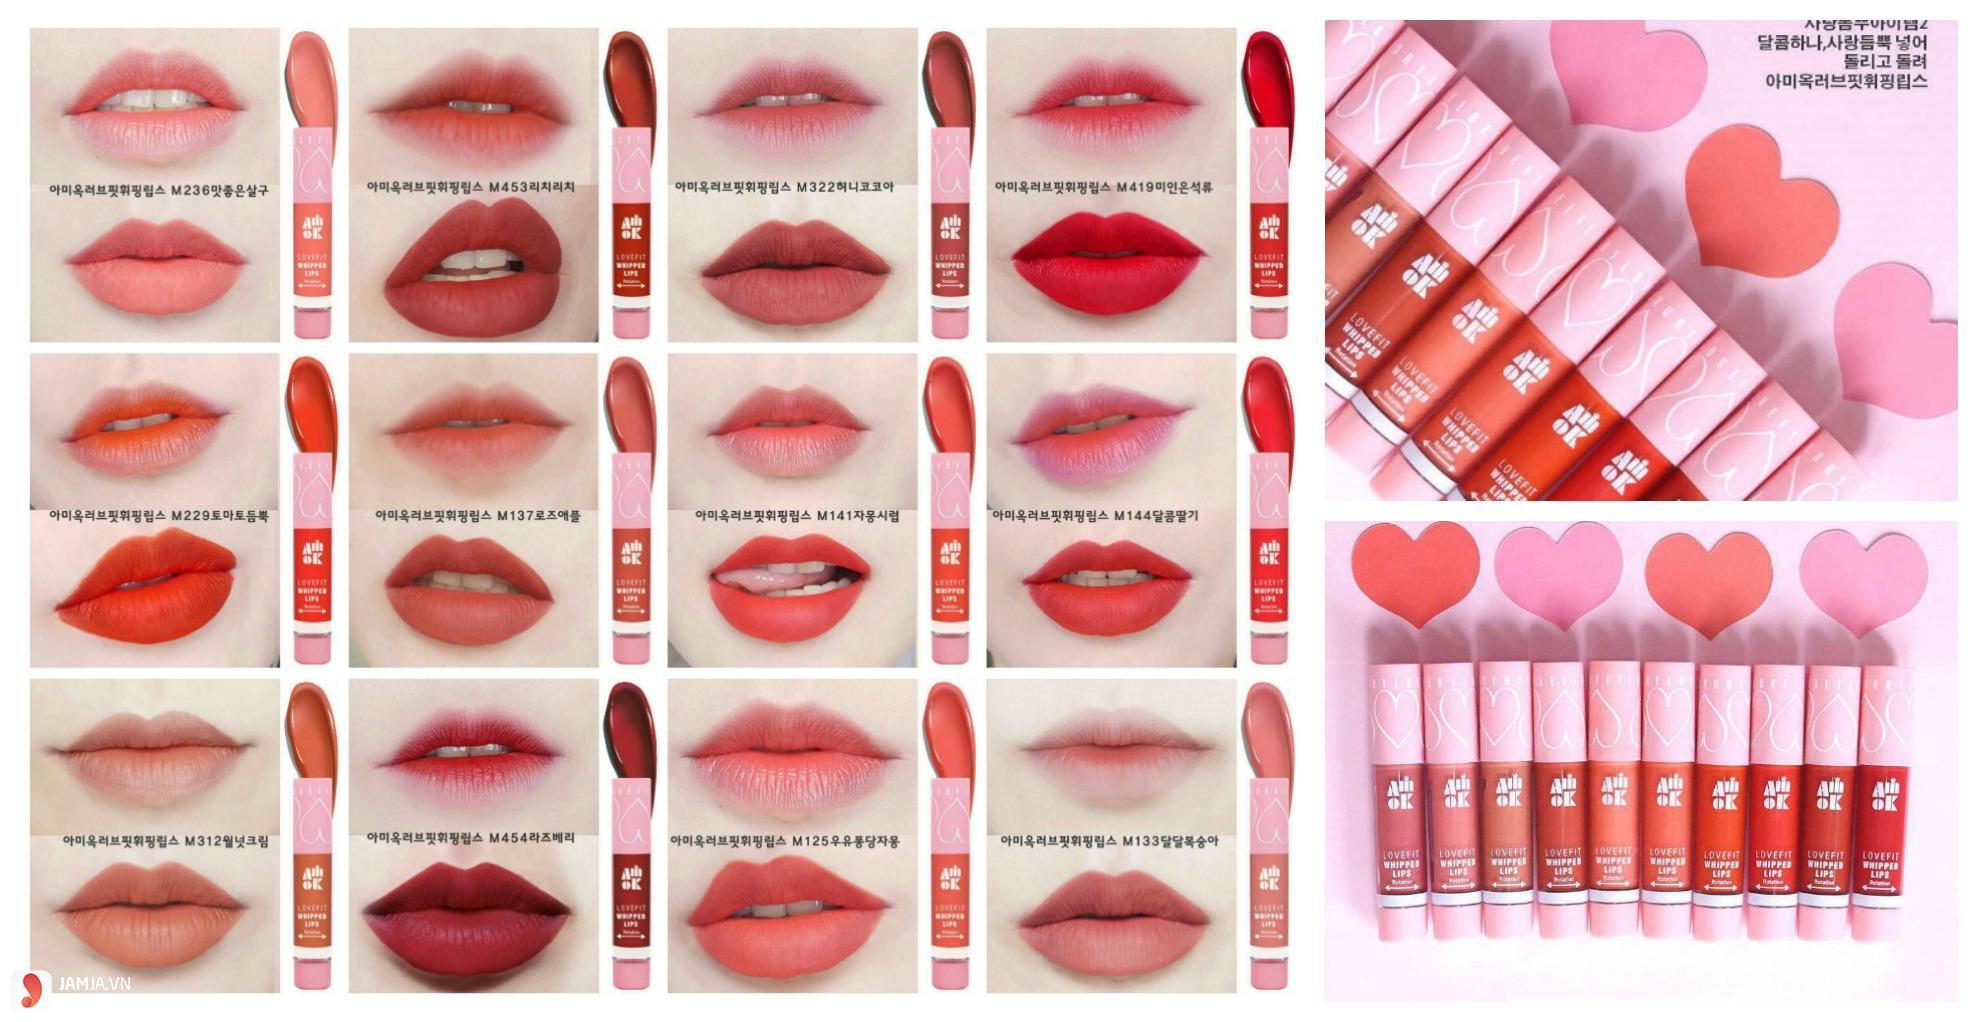 Bảng màu son Amok Lovefit Whipped Lips